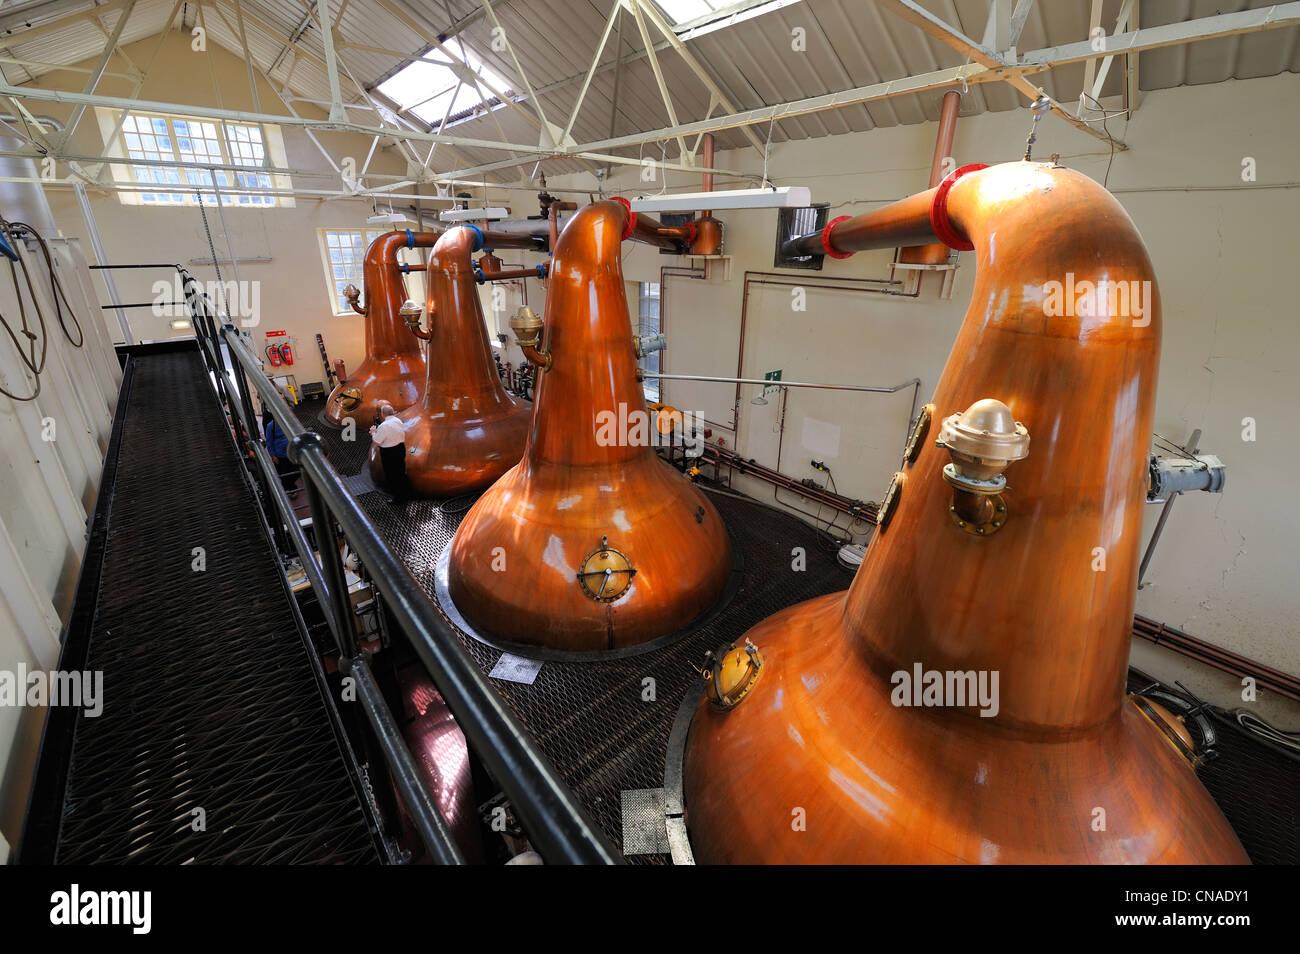 United Kingdom, Scotland, Orkney Islands, Kirkwall, Highland Park whisky distillery, Wash distillation in Pot Stills - Stock Image